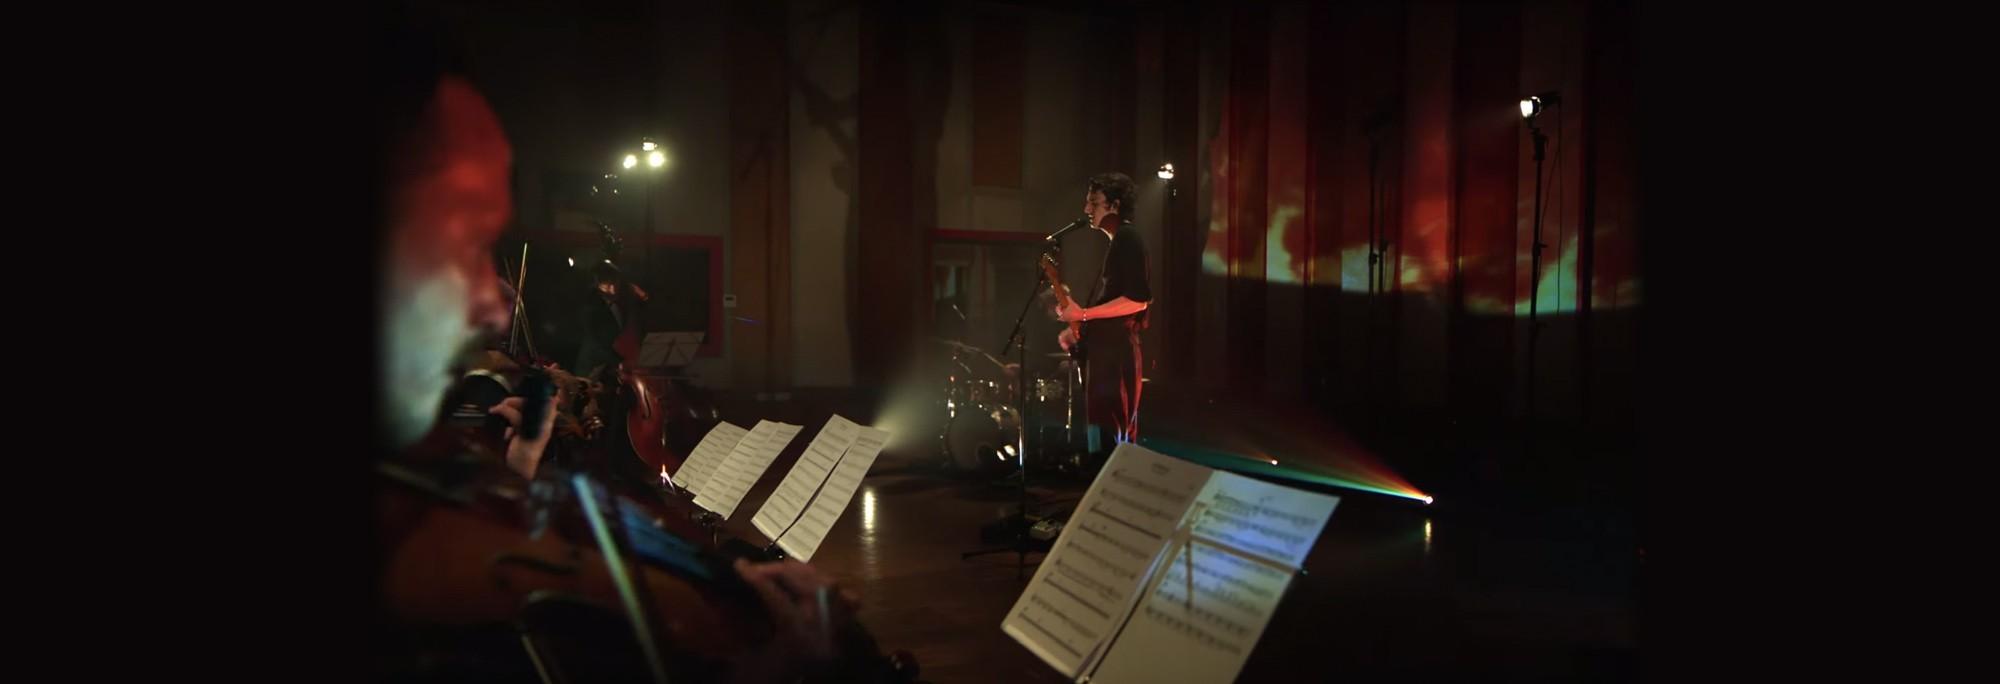 Tamino - Intervals (Live at Jet Studio ft. Nagham Zikrayat Orchestra)